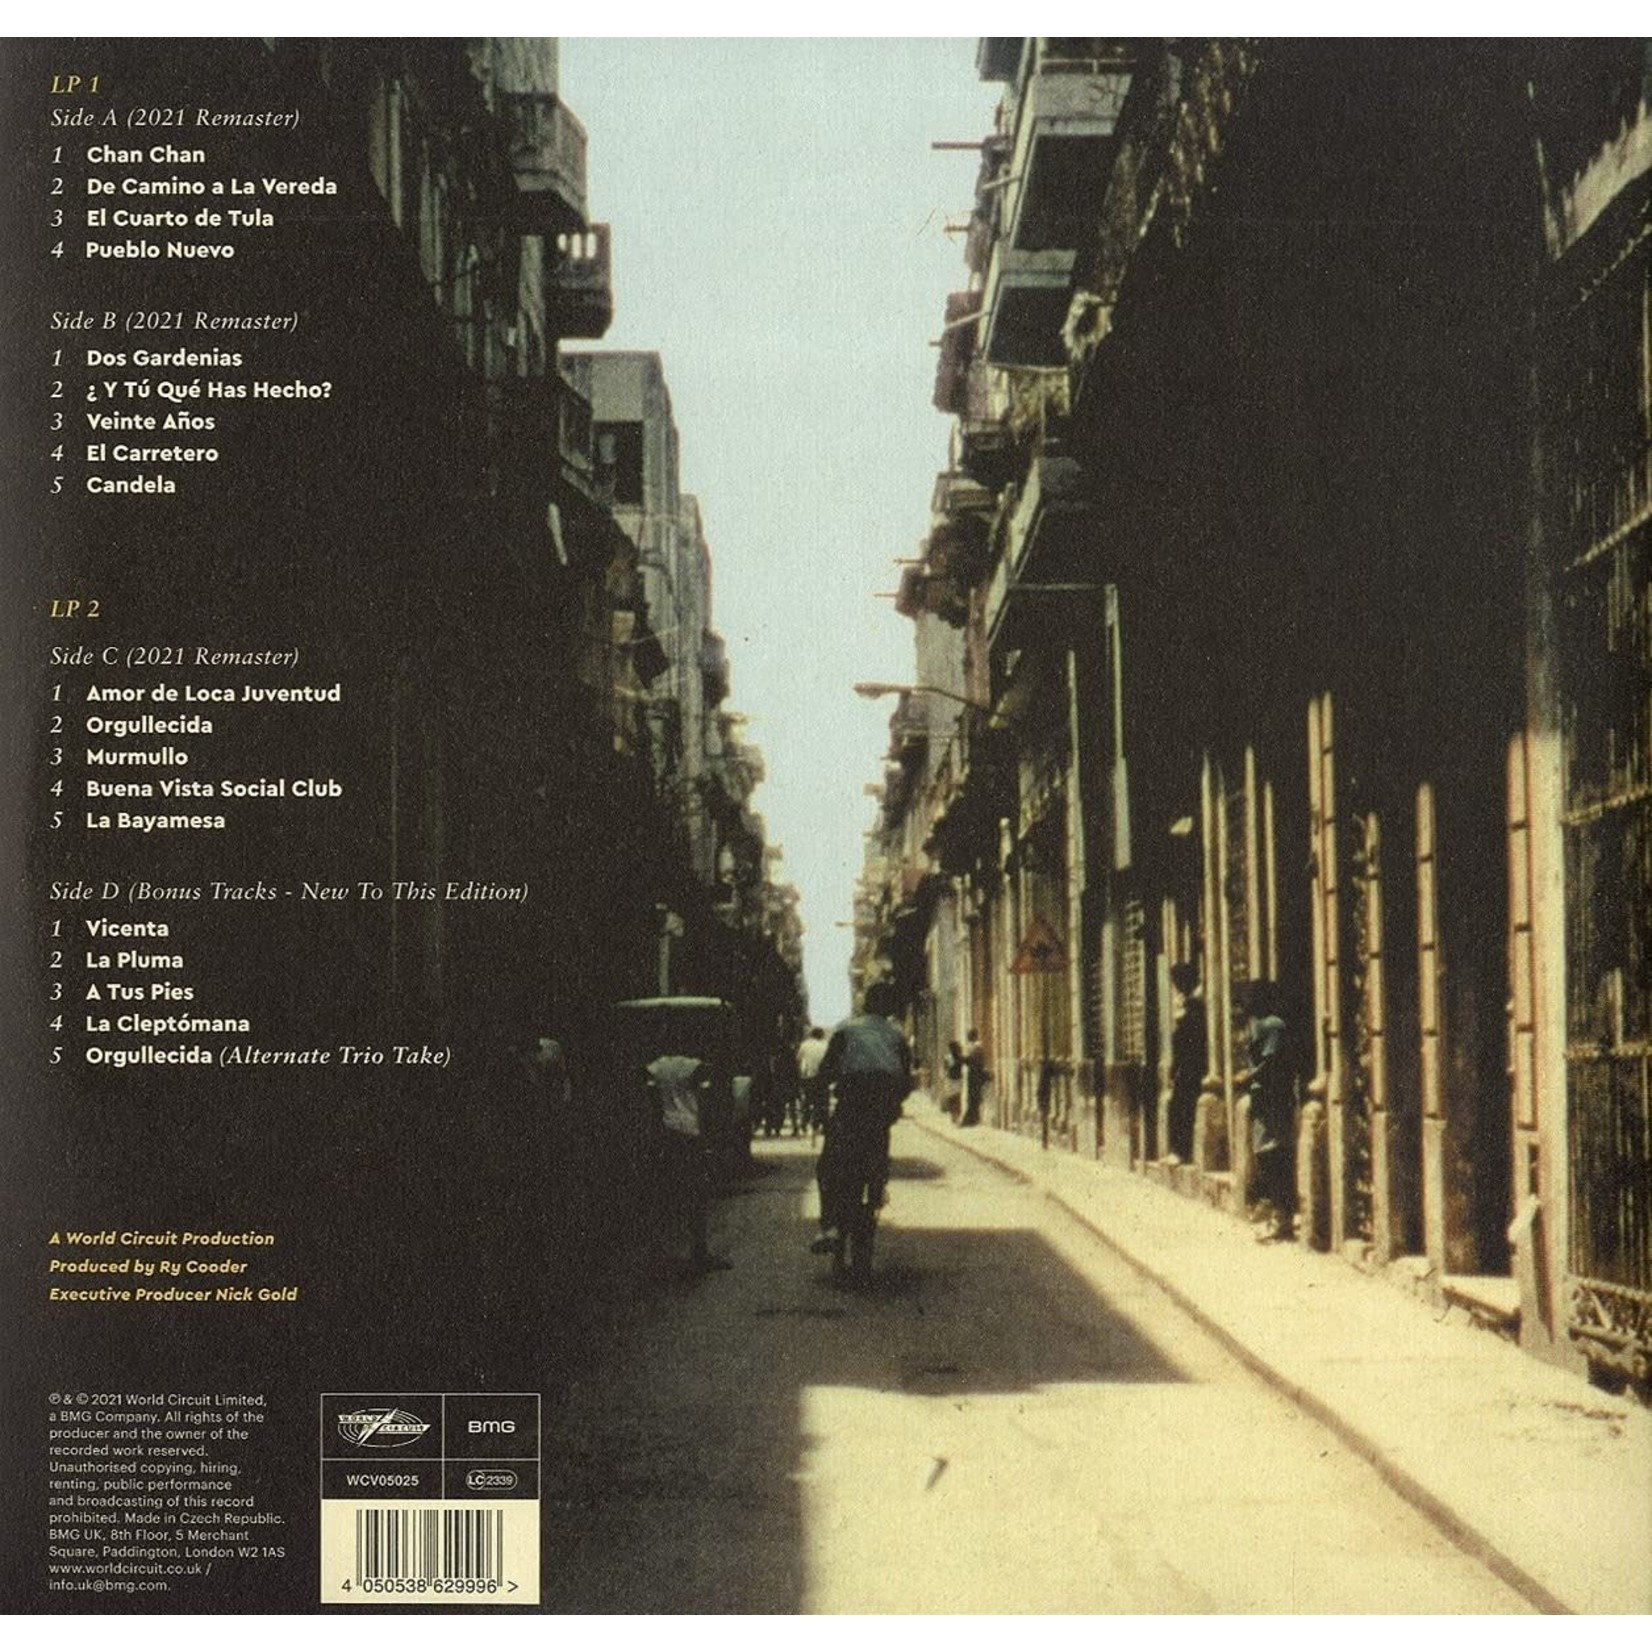 Vinyl Buena Vista Social Club - ST  (25th Anniversary)